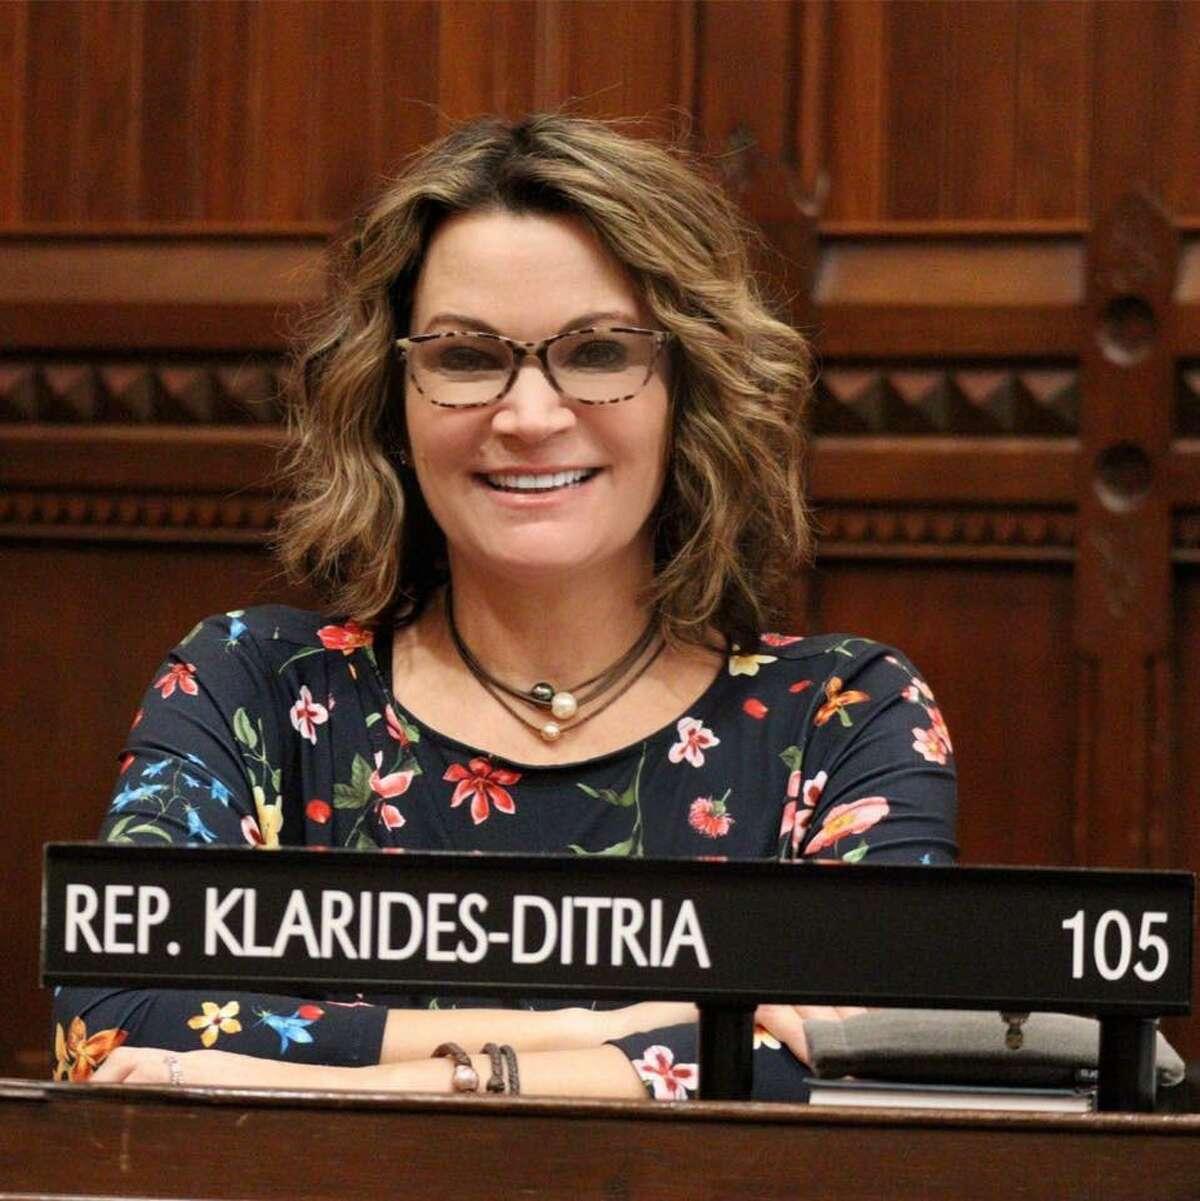 Nicole Klarides-Ditria,